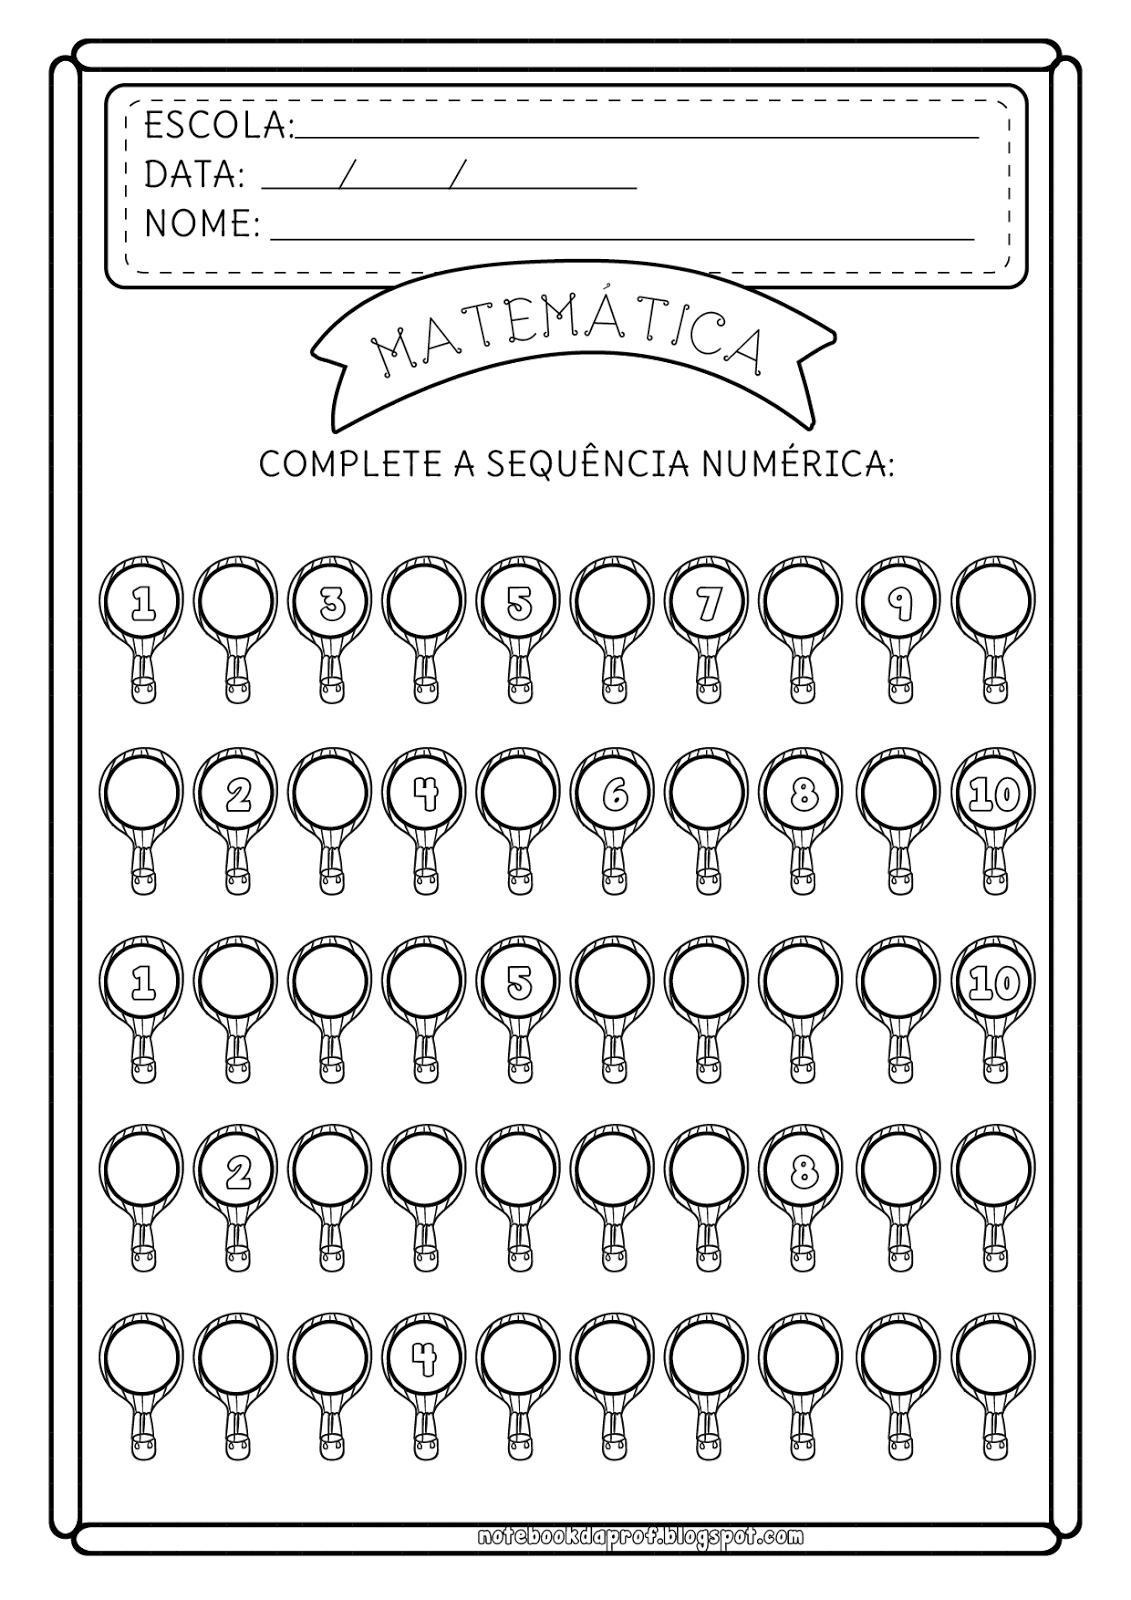 Atividades De Matematica Sequencia Numerica